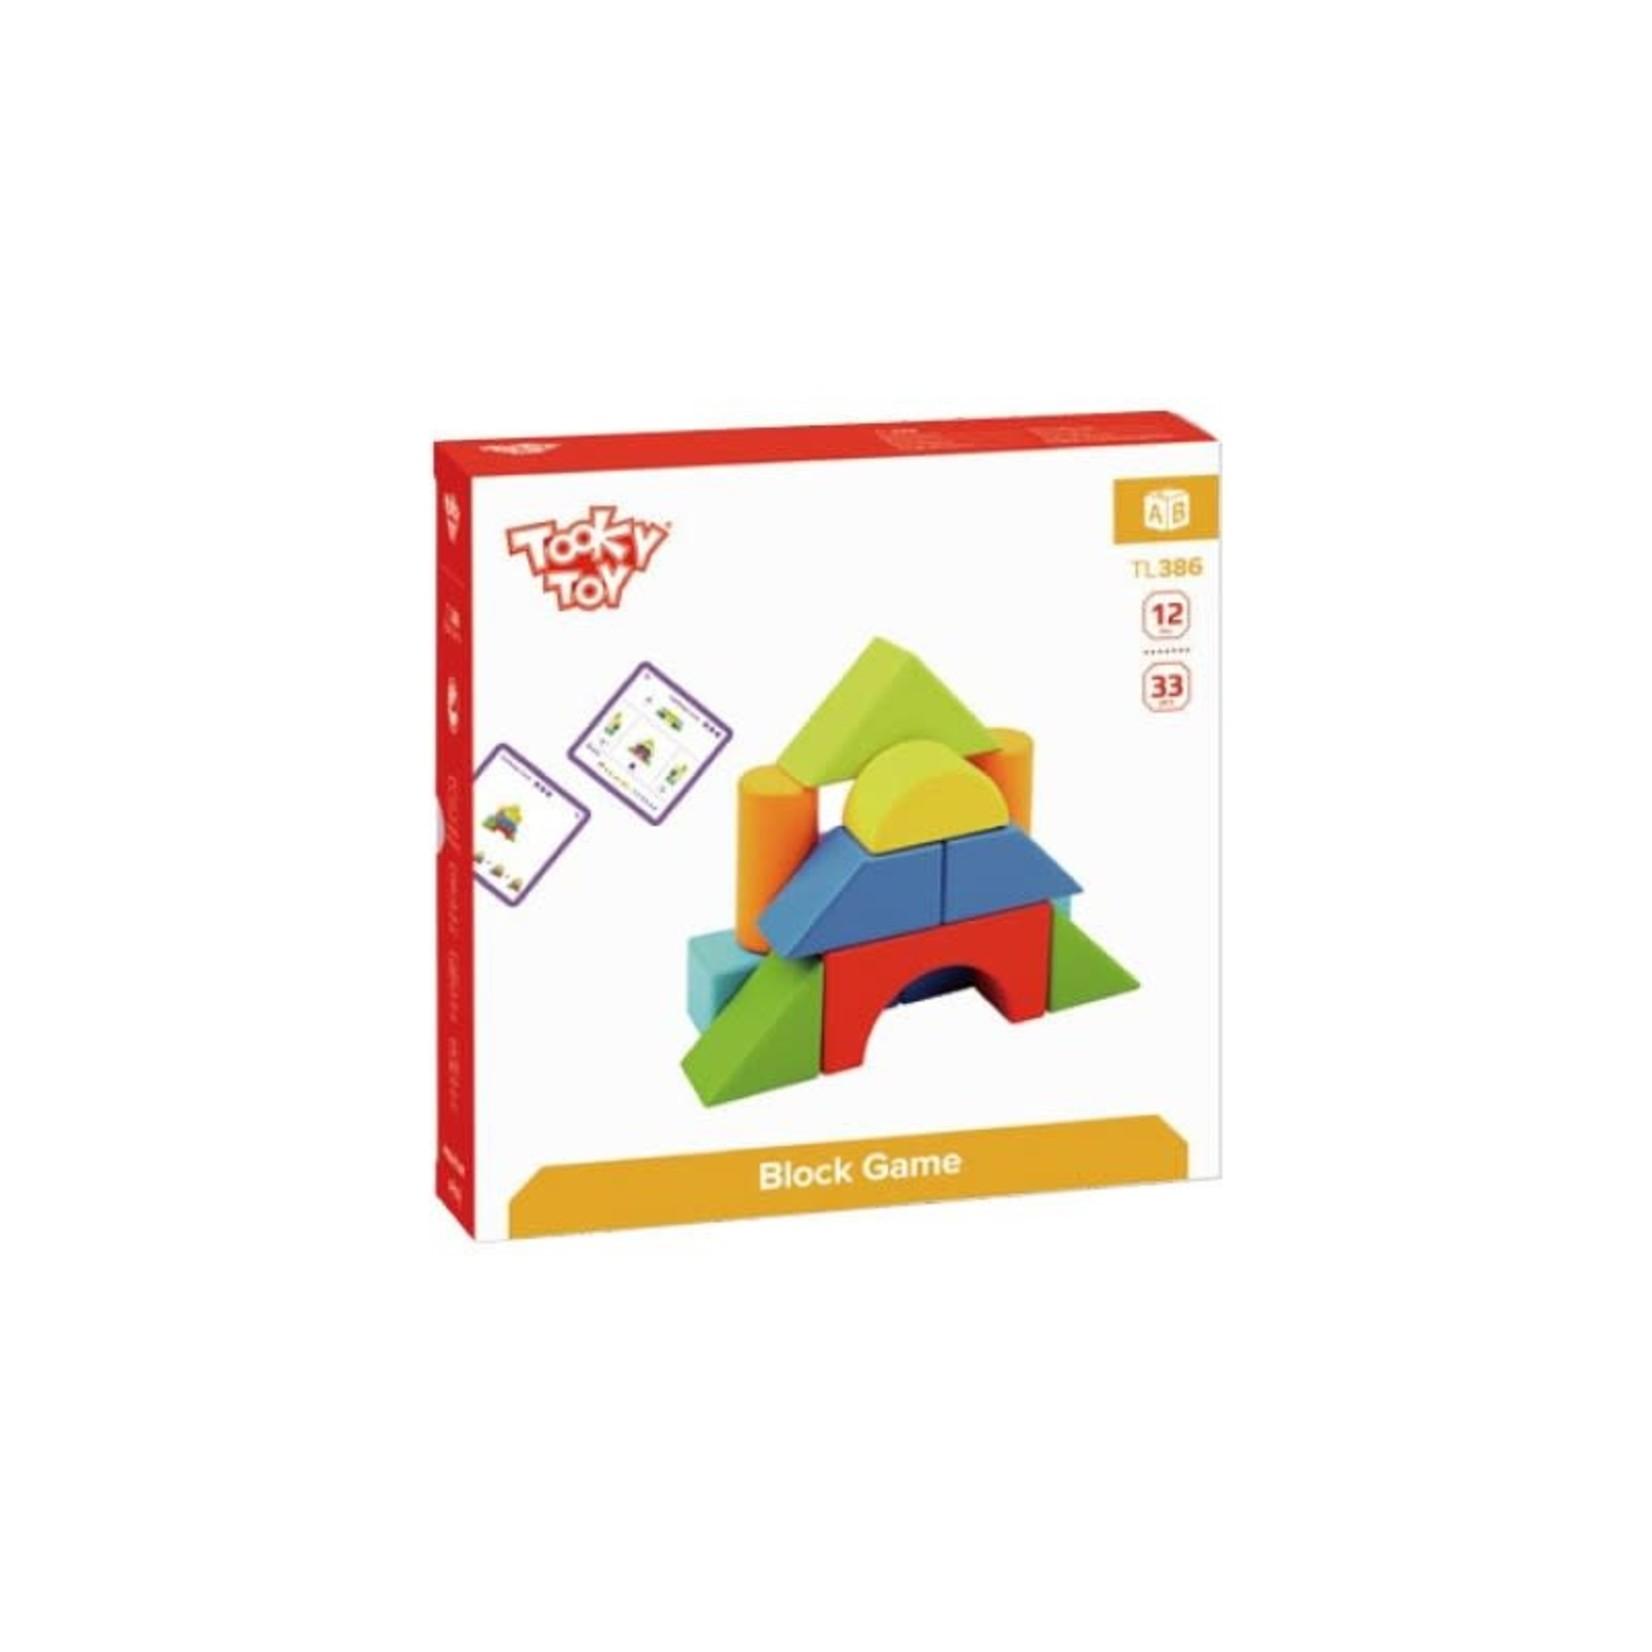 Tooky Toy Block Game